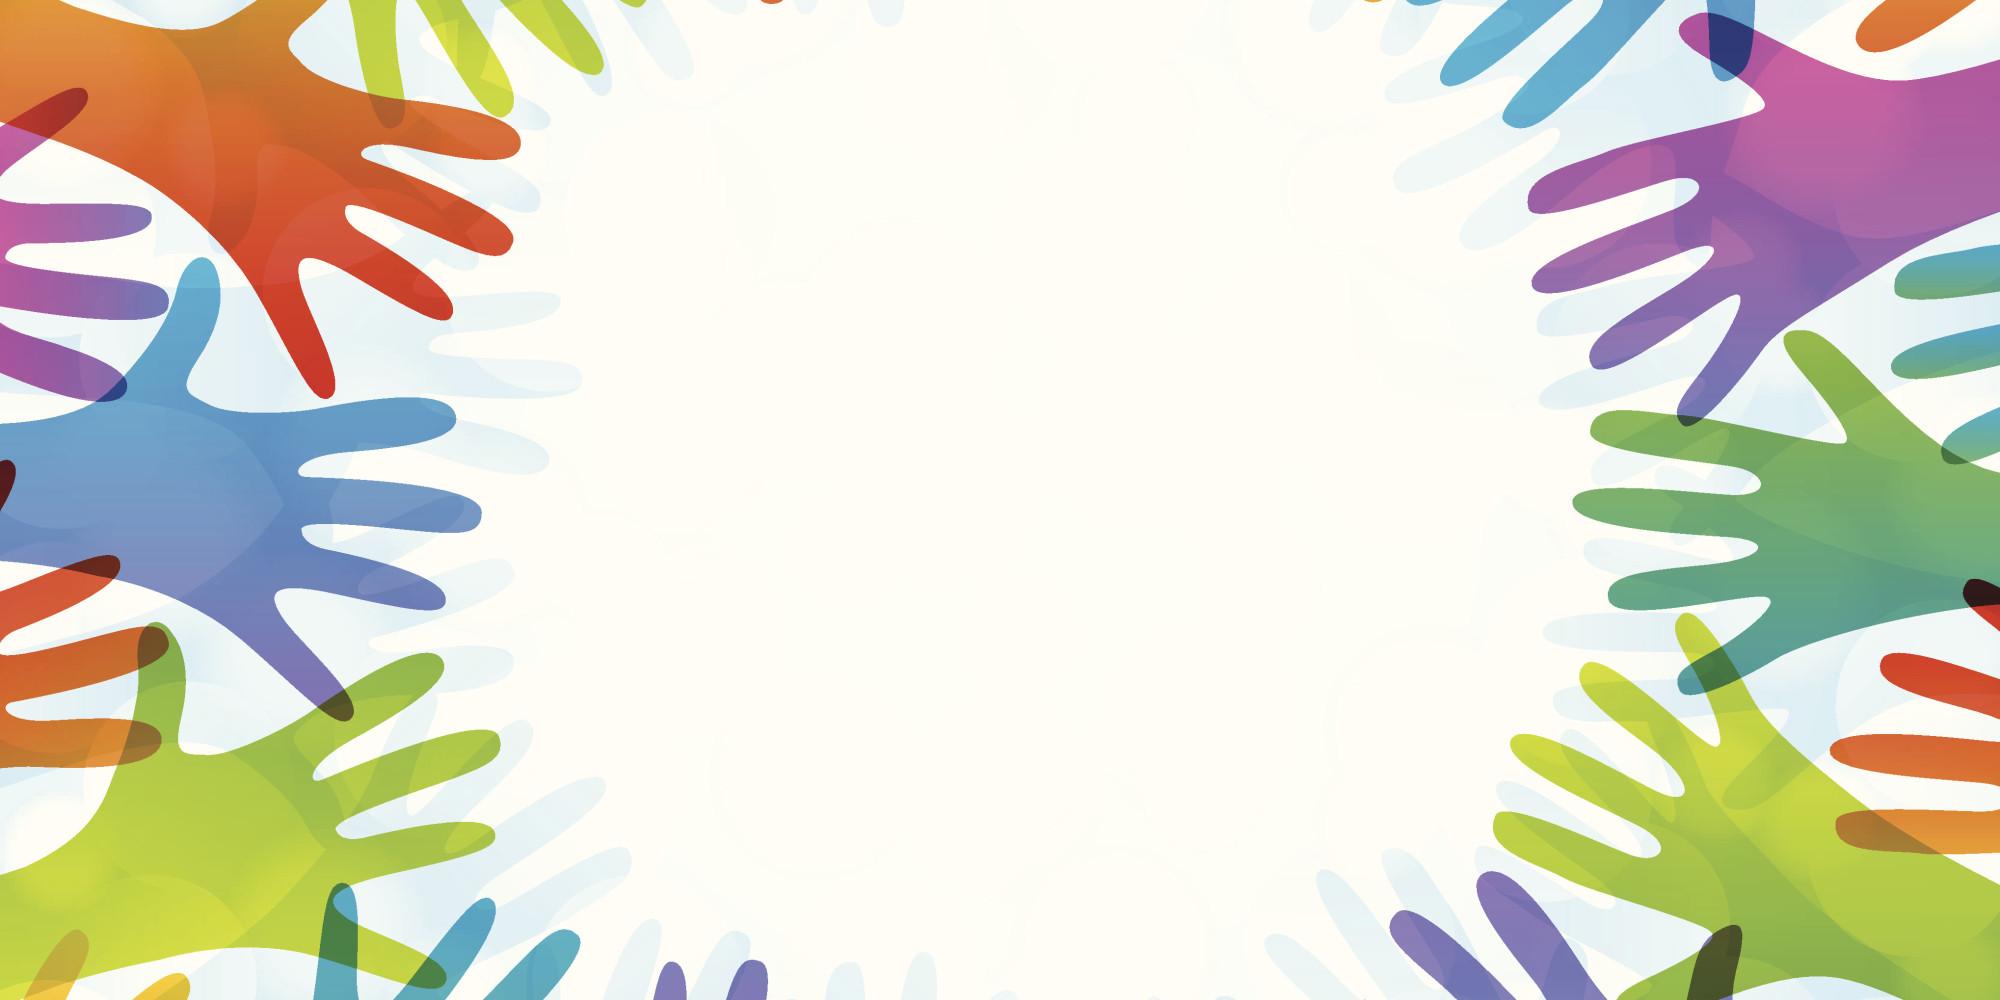 Volunteering 101: Listen and Learn | HuffPost UK